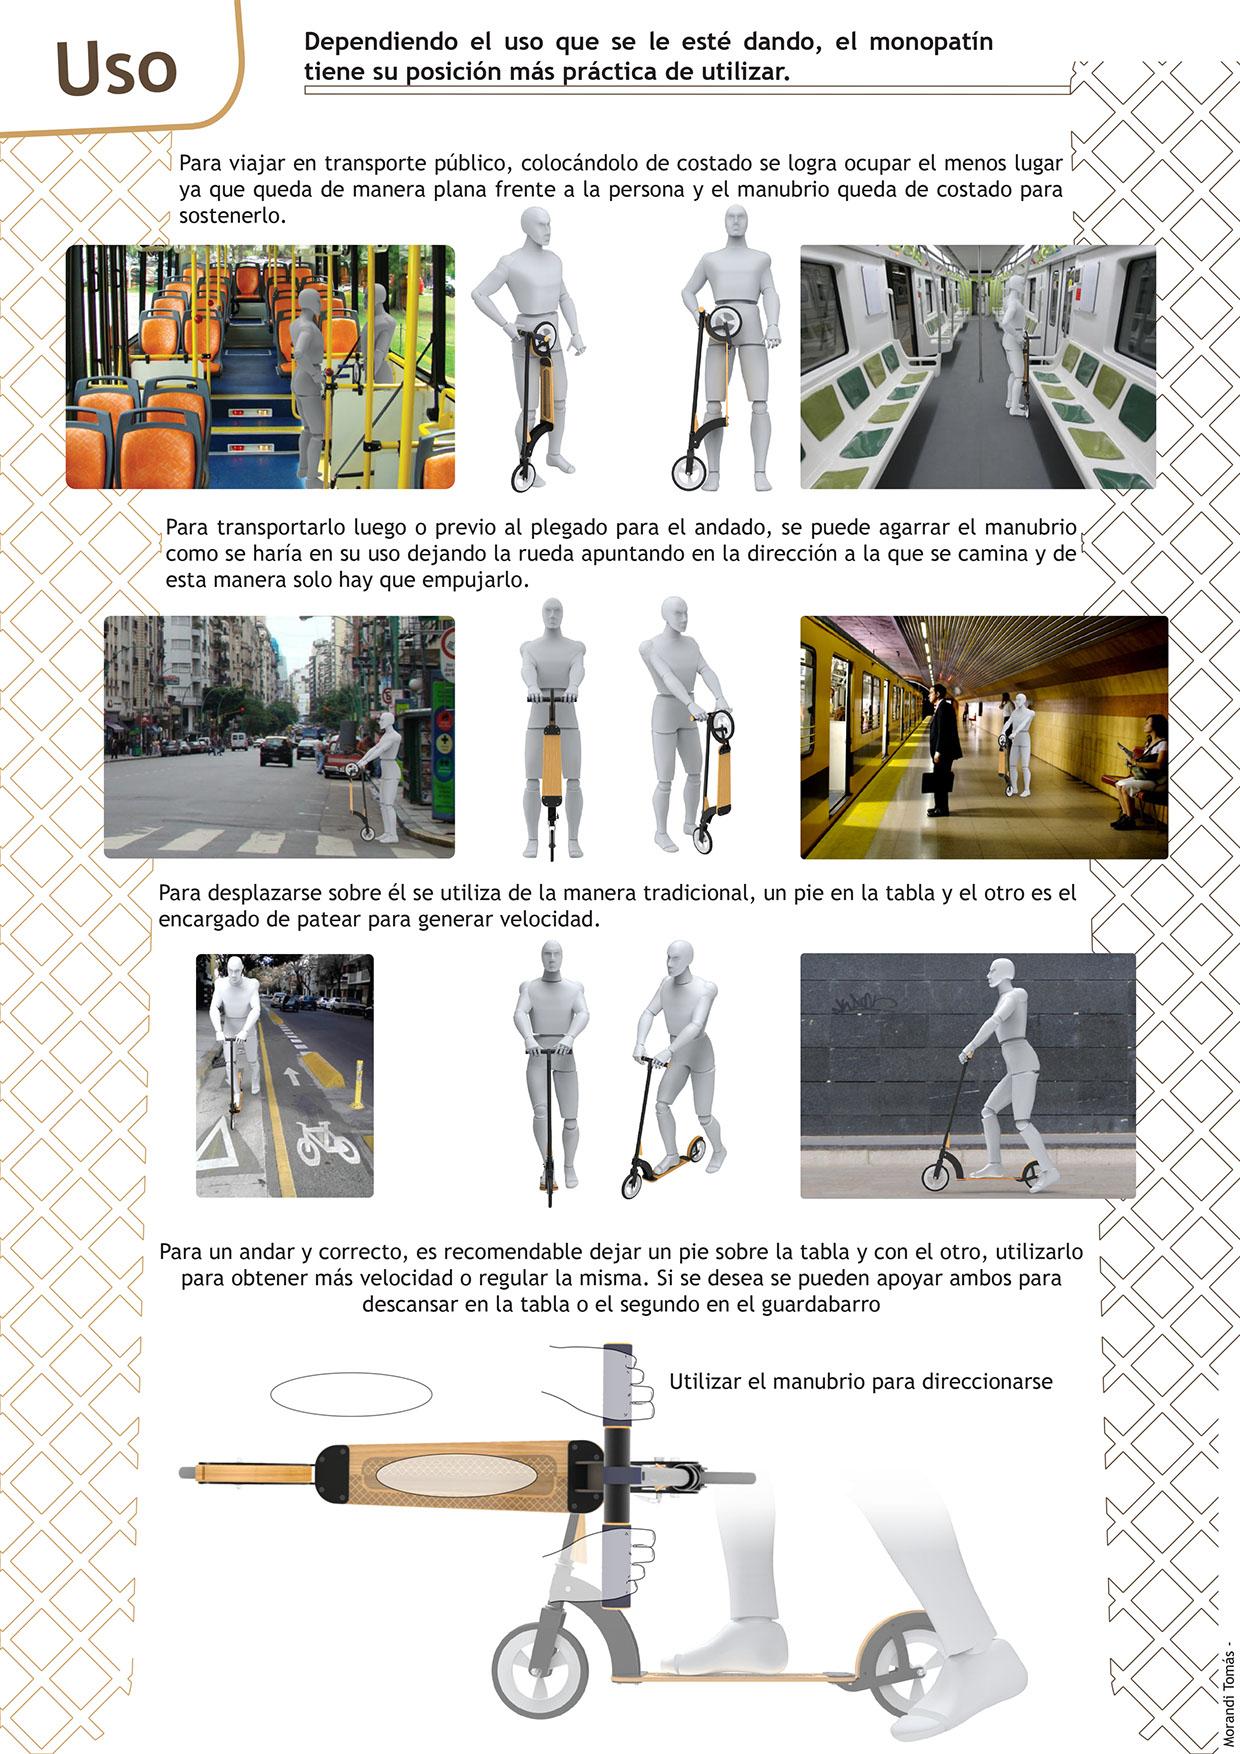 Самокат среды №78. Прототип из Аргентины